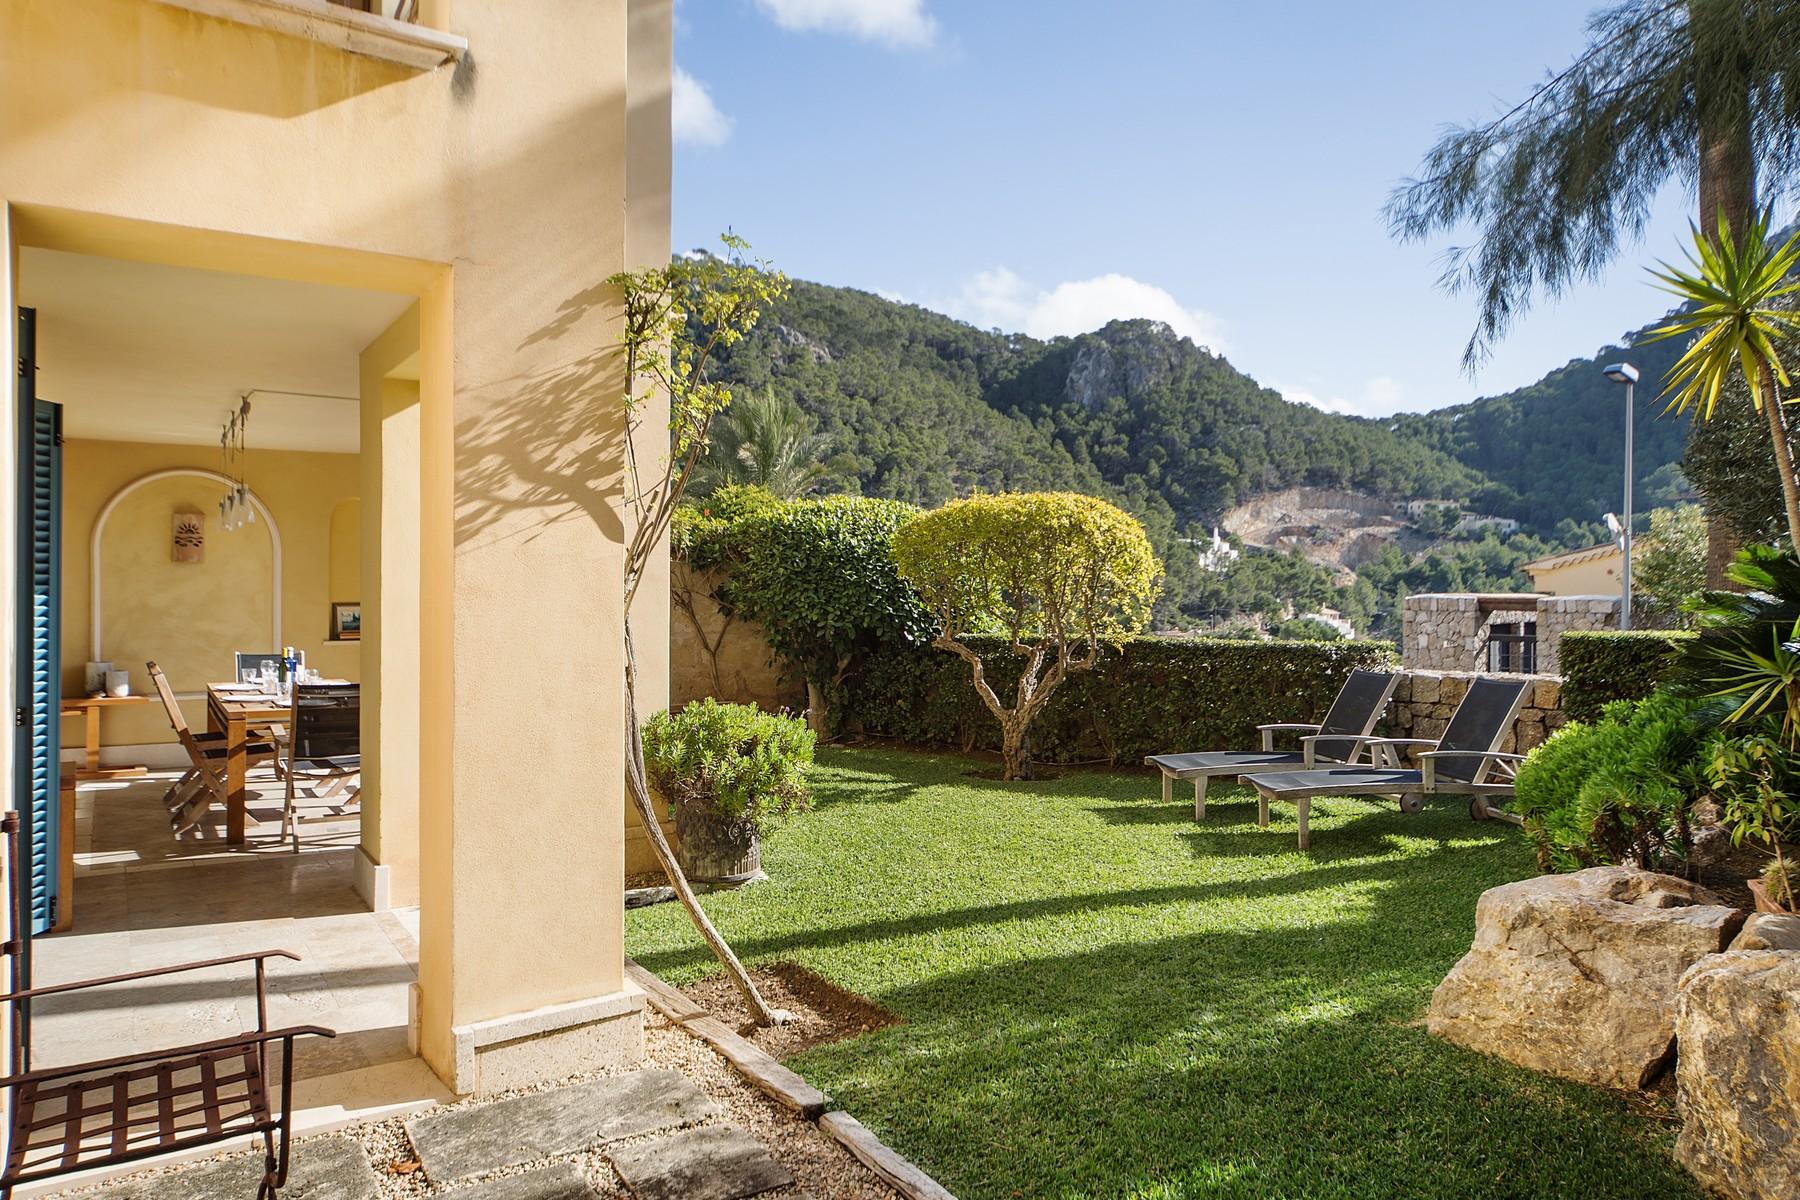 Apartamento para Venda às Apartment with private garden in Pto Andratx Other Balearic Islands, Balearic Islands, 07157 Espanha